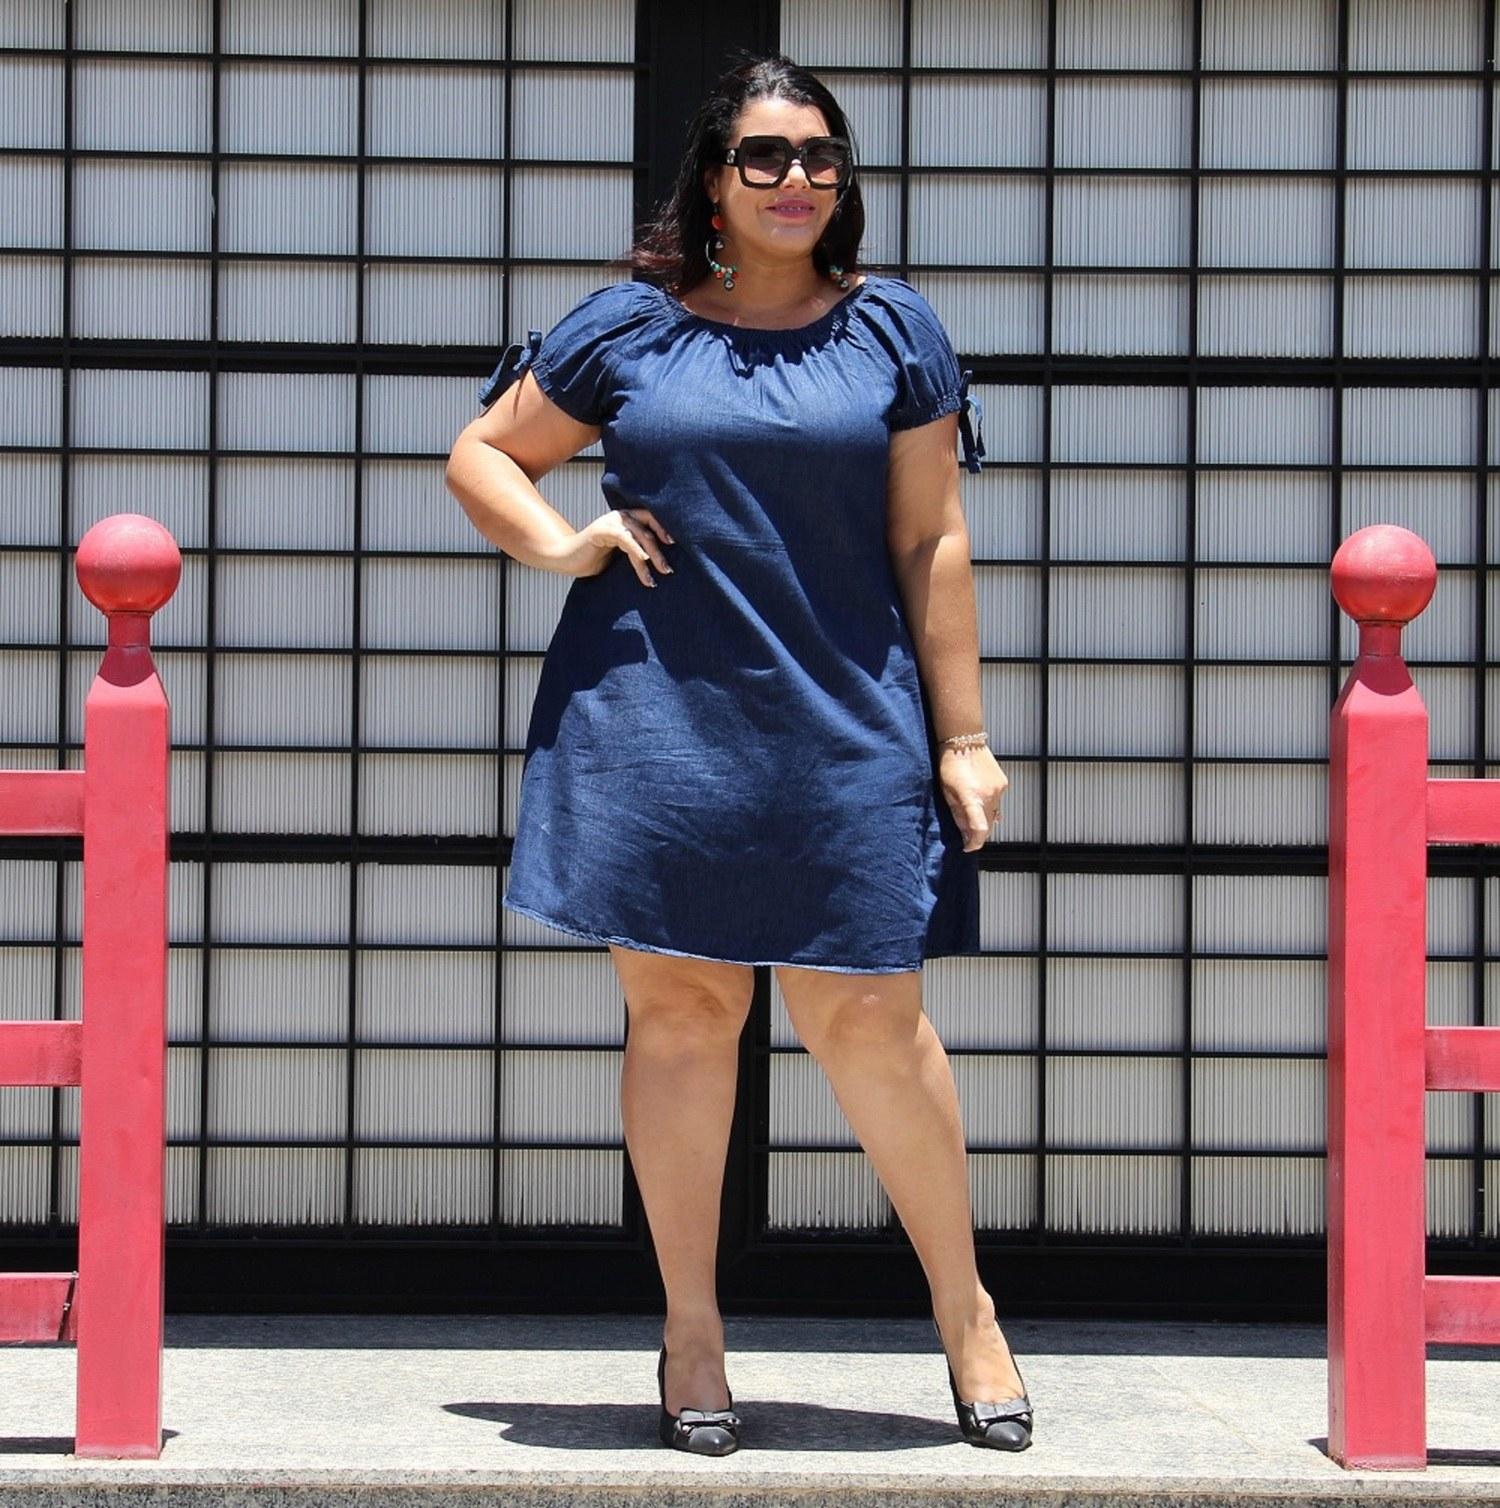 Vestido curto tipo ciganinha jeans Posh Eruptionjeans-Plus Size AMA [3413]